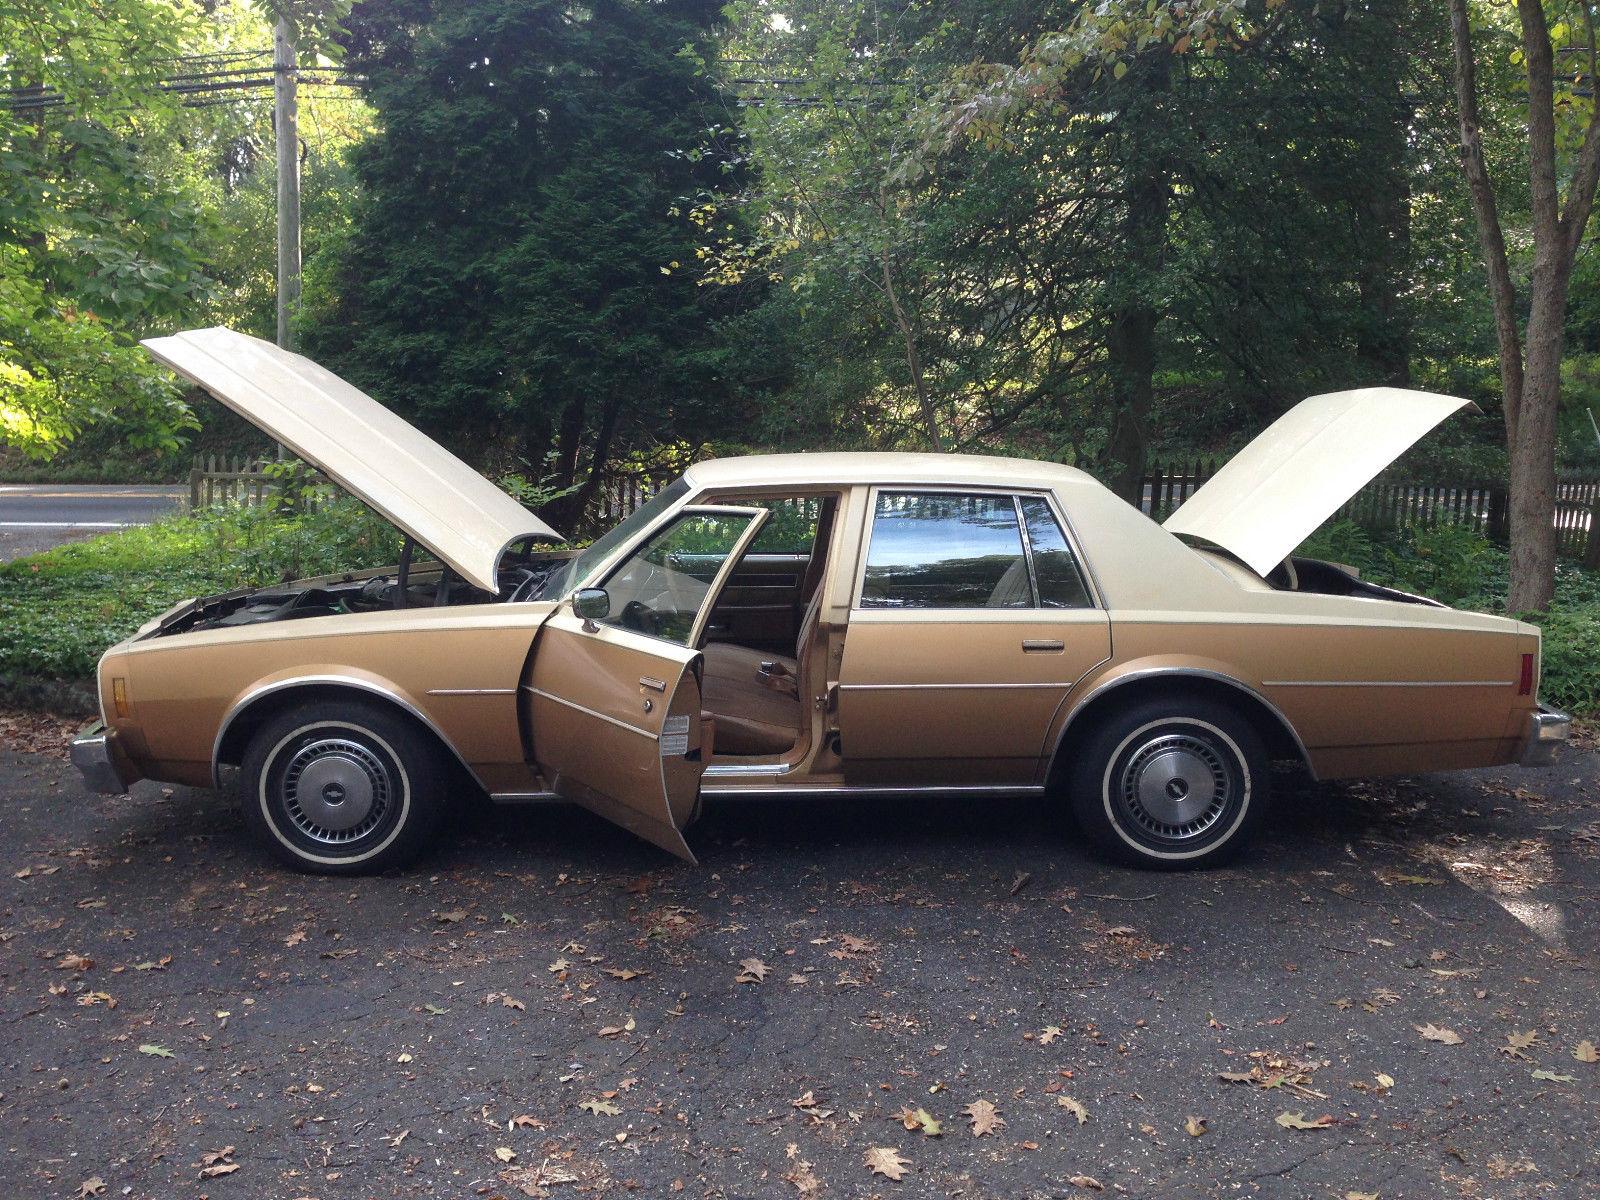 Chevy Impala 4 Door 1978 Classic Chevrolet Impala 1978